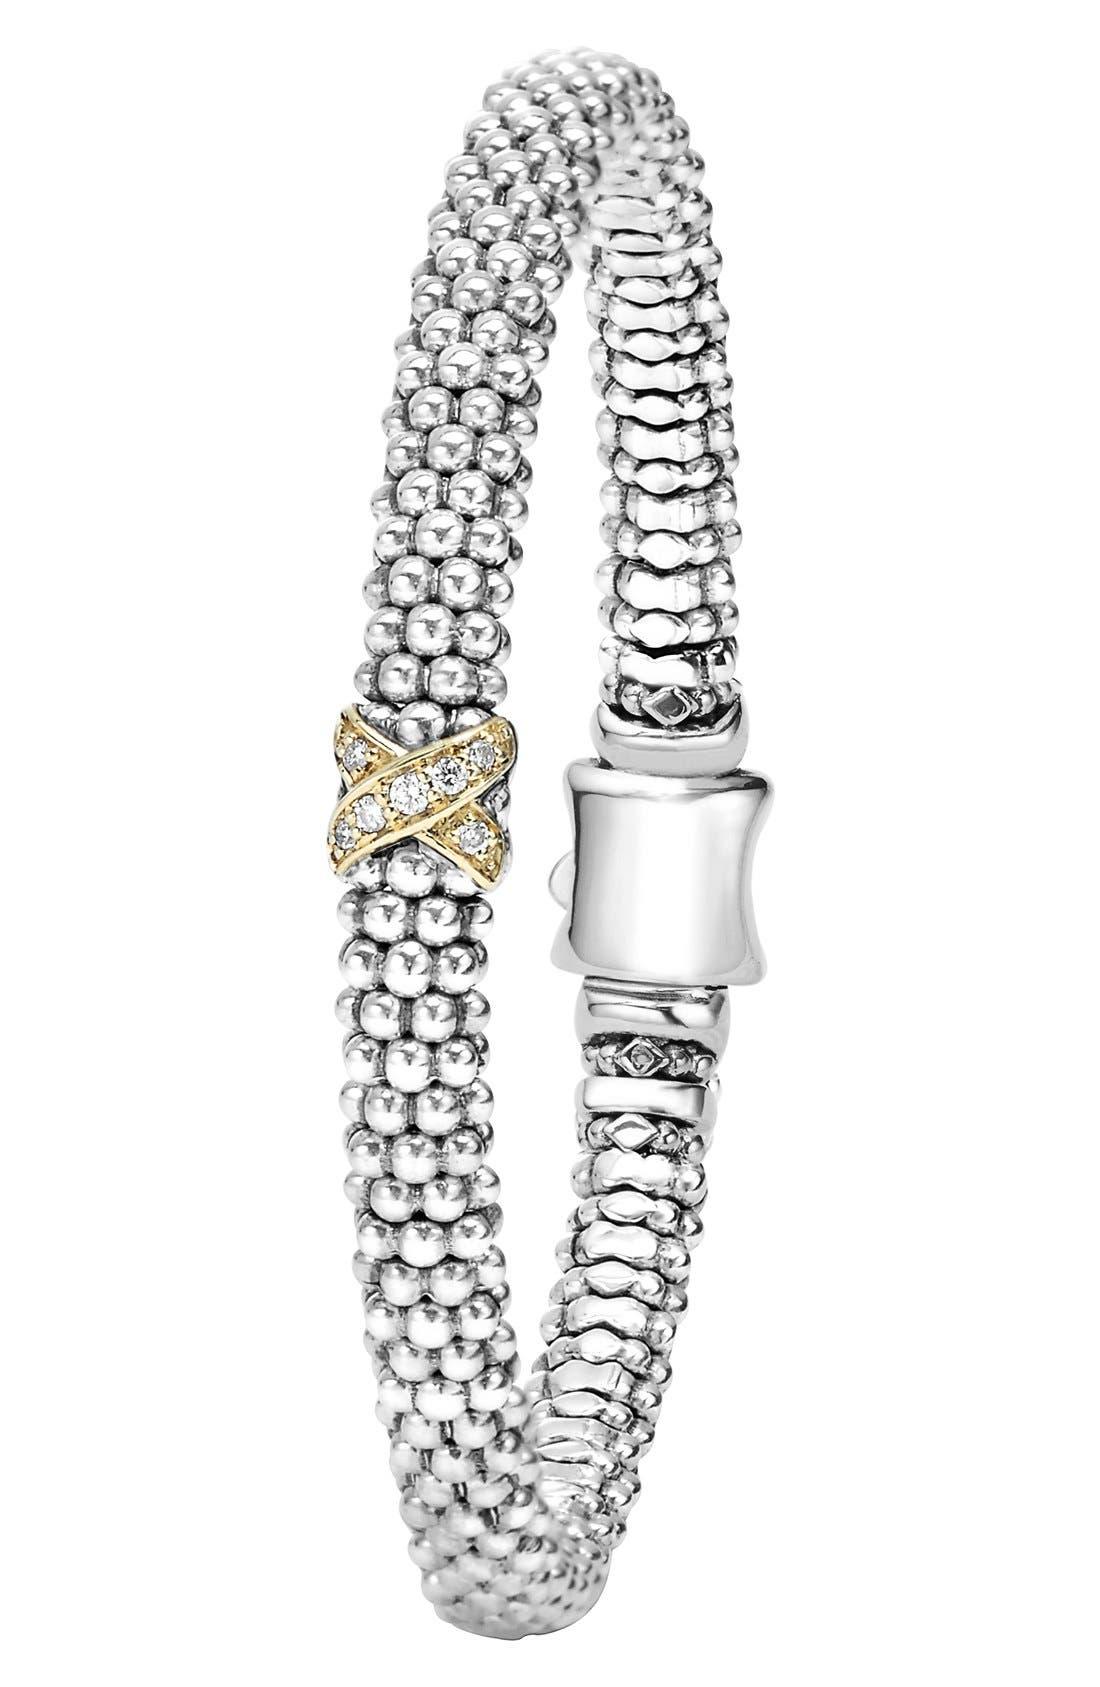 Caviar 'Signature Caviar' Diamond Rope Bracelet,                             Alternate thumbnail 3, color,                             STERLING SILVER/ GOLD